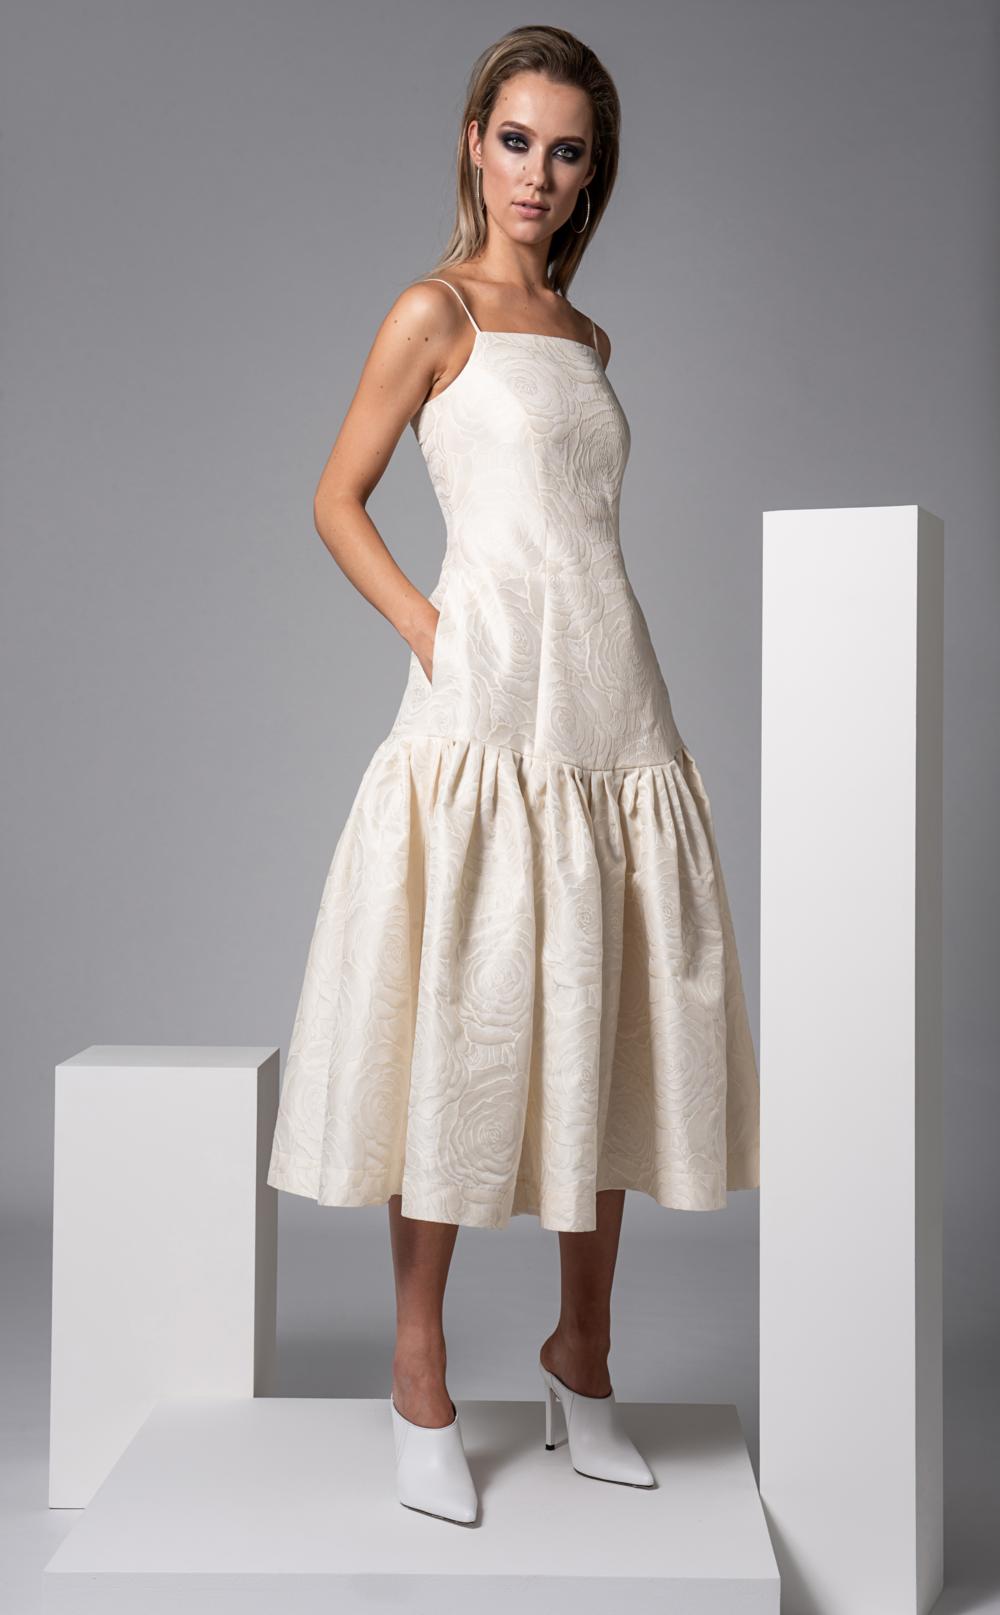 Harris Dress